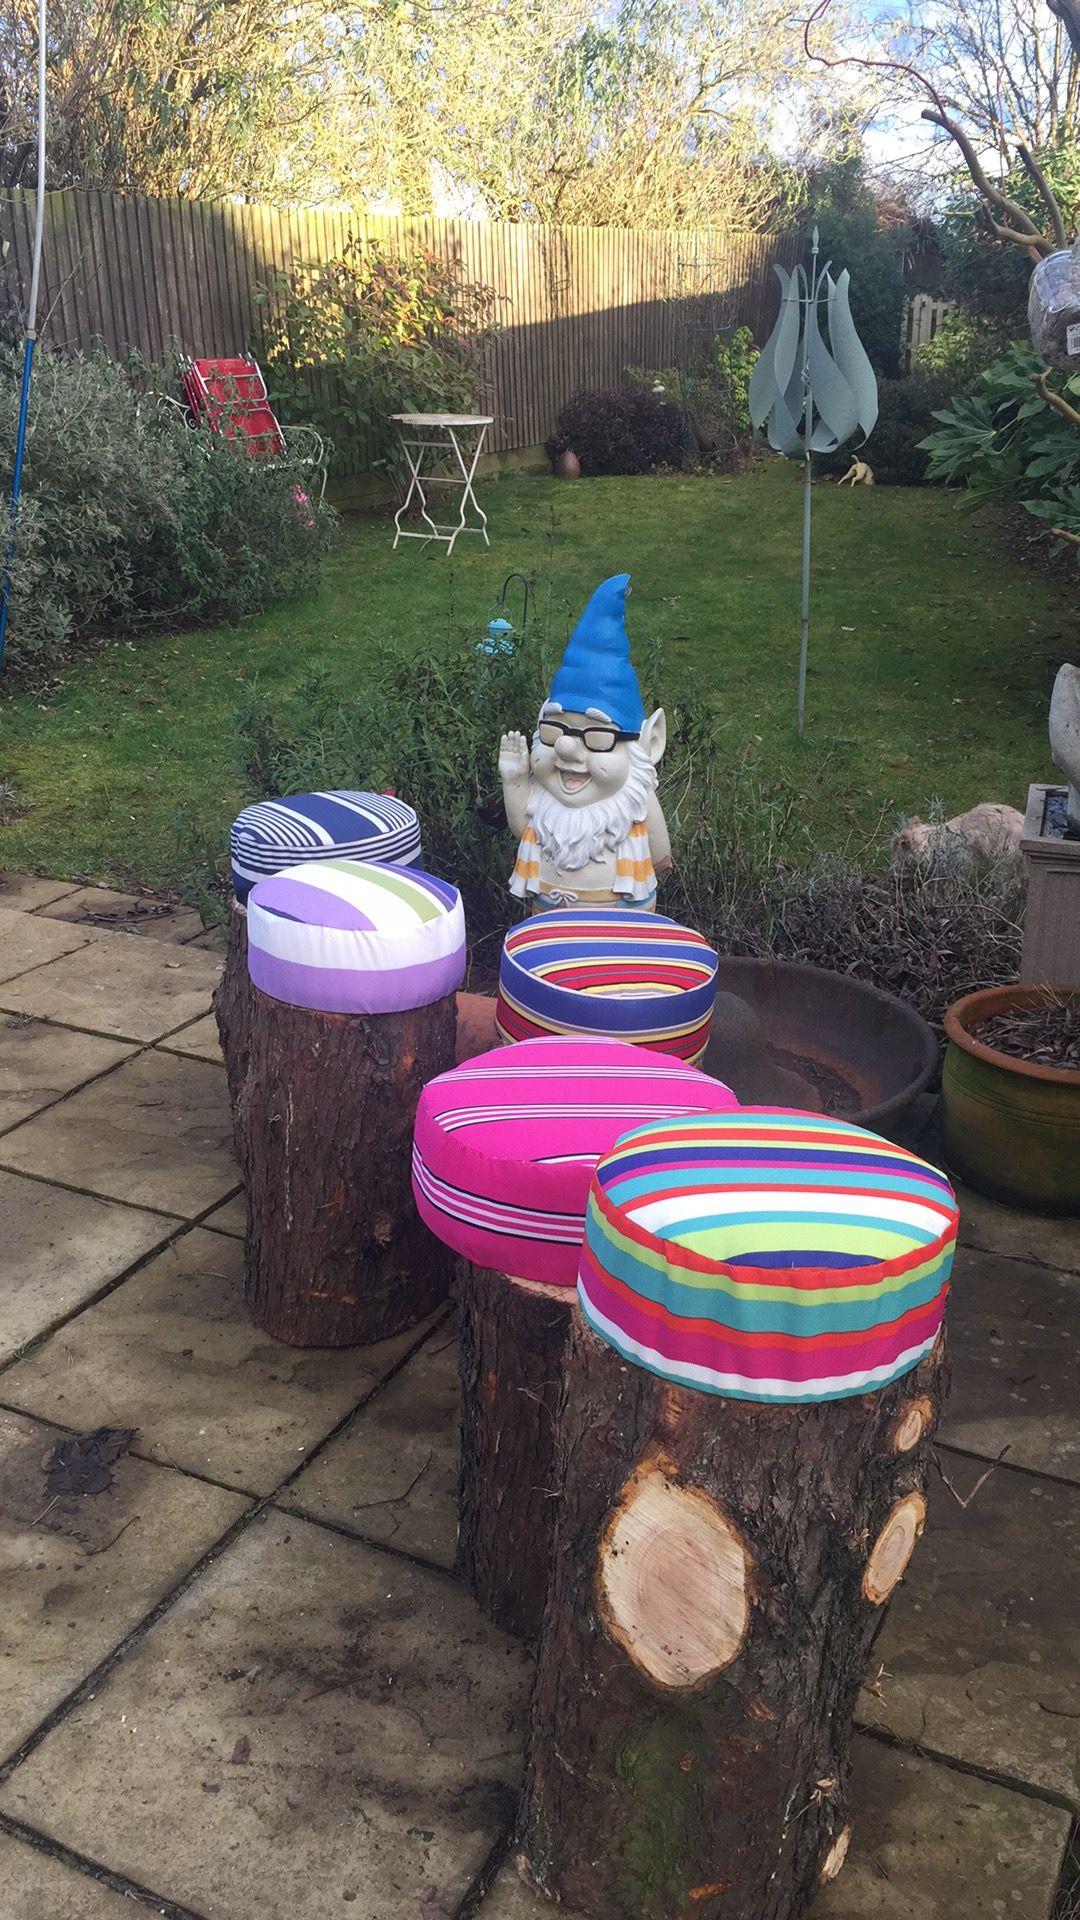 Tree stump stools. Cushions made from waterproof fabric